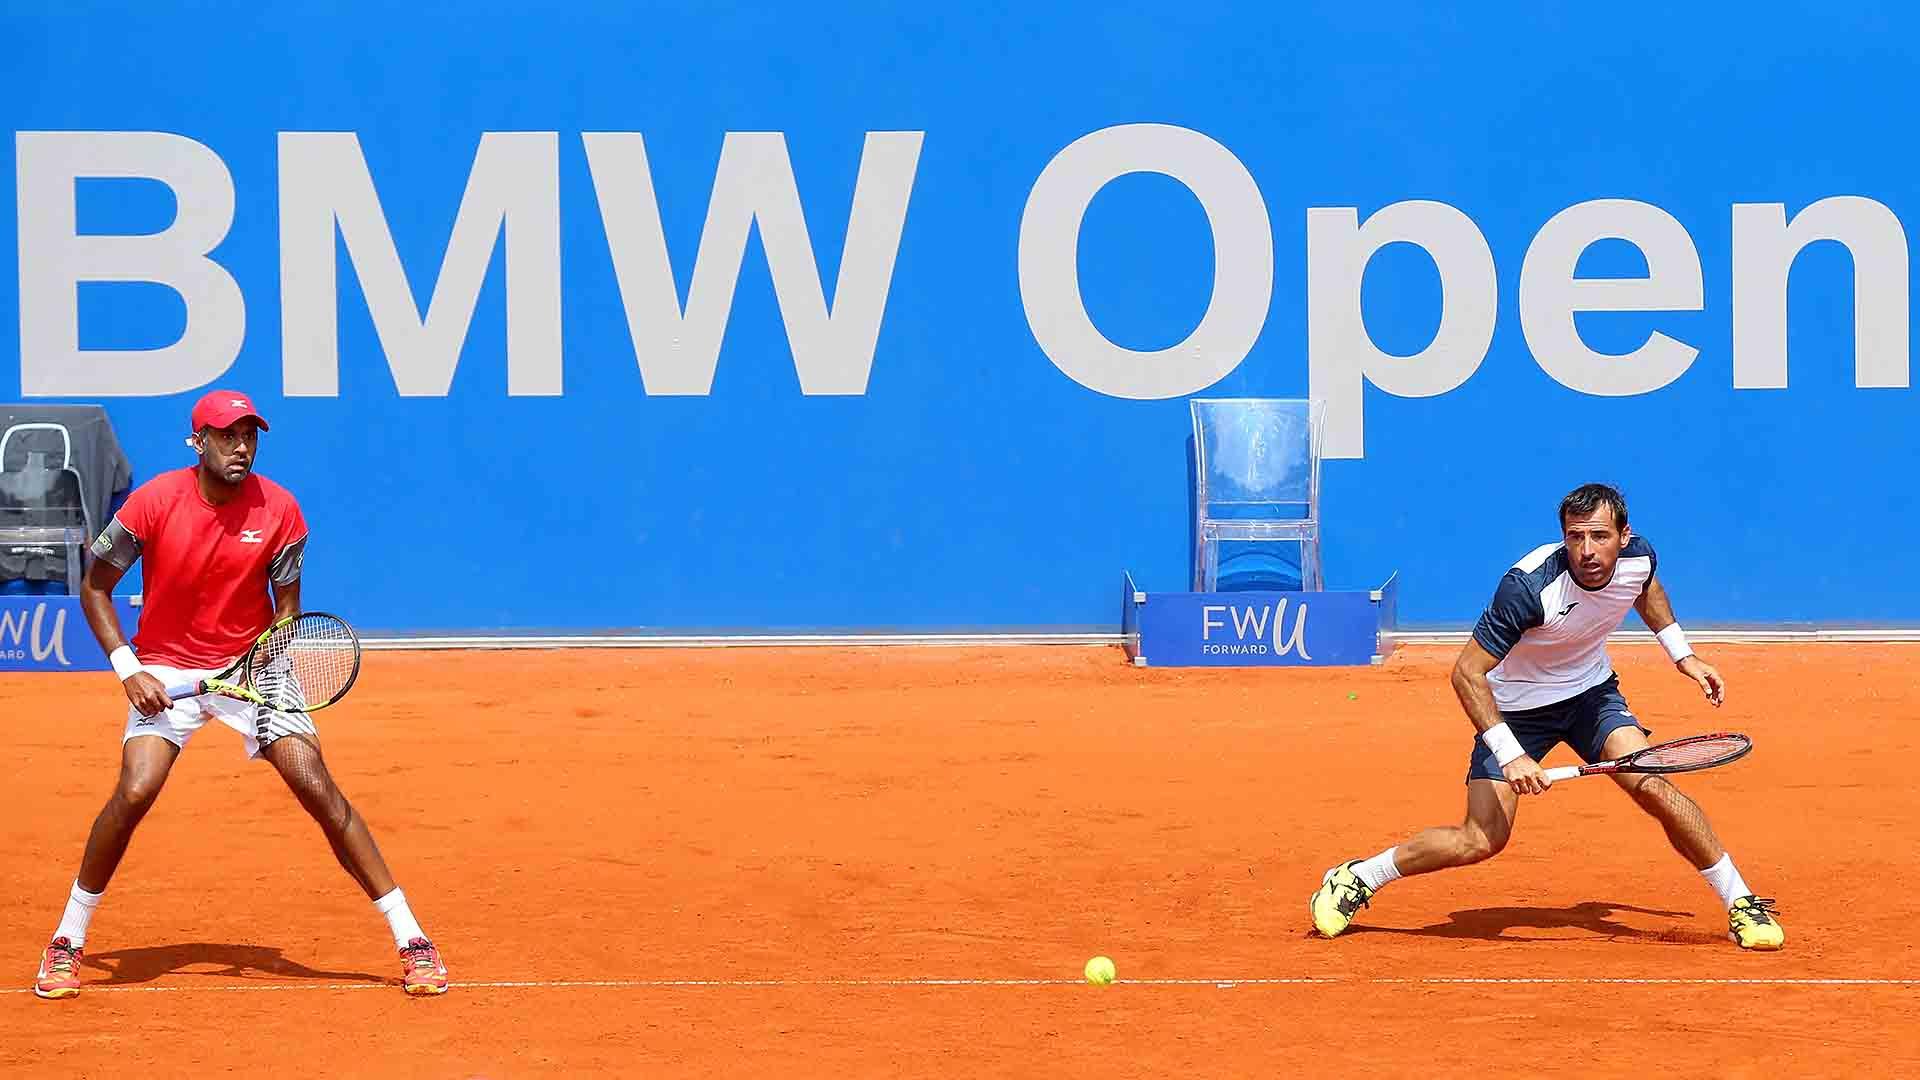 Bmw open 2018 tennis